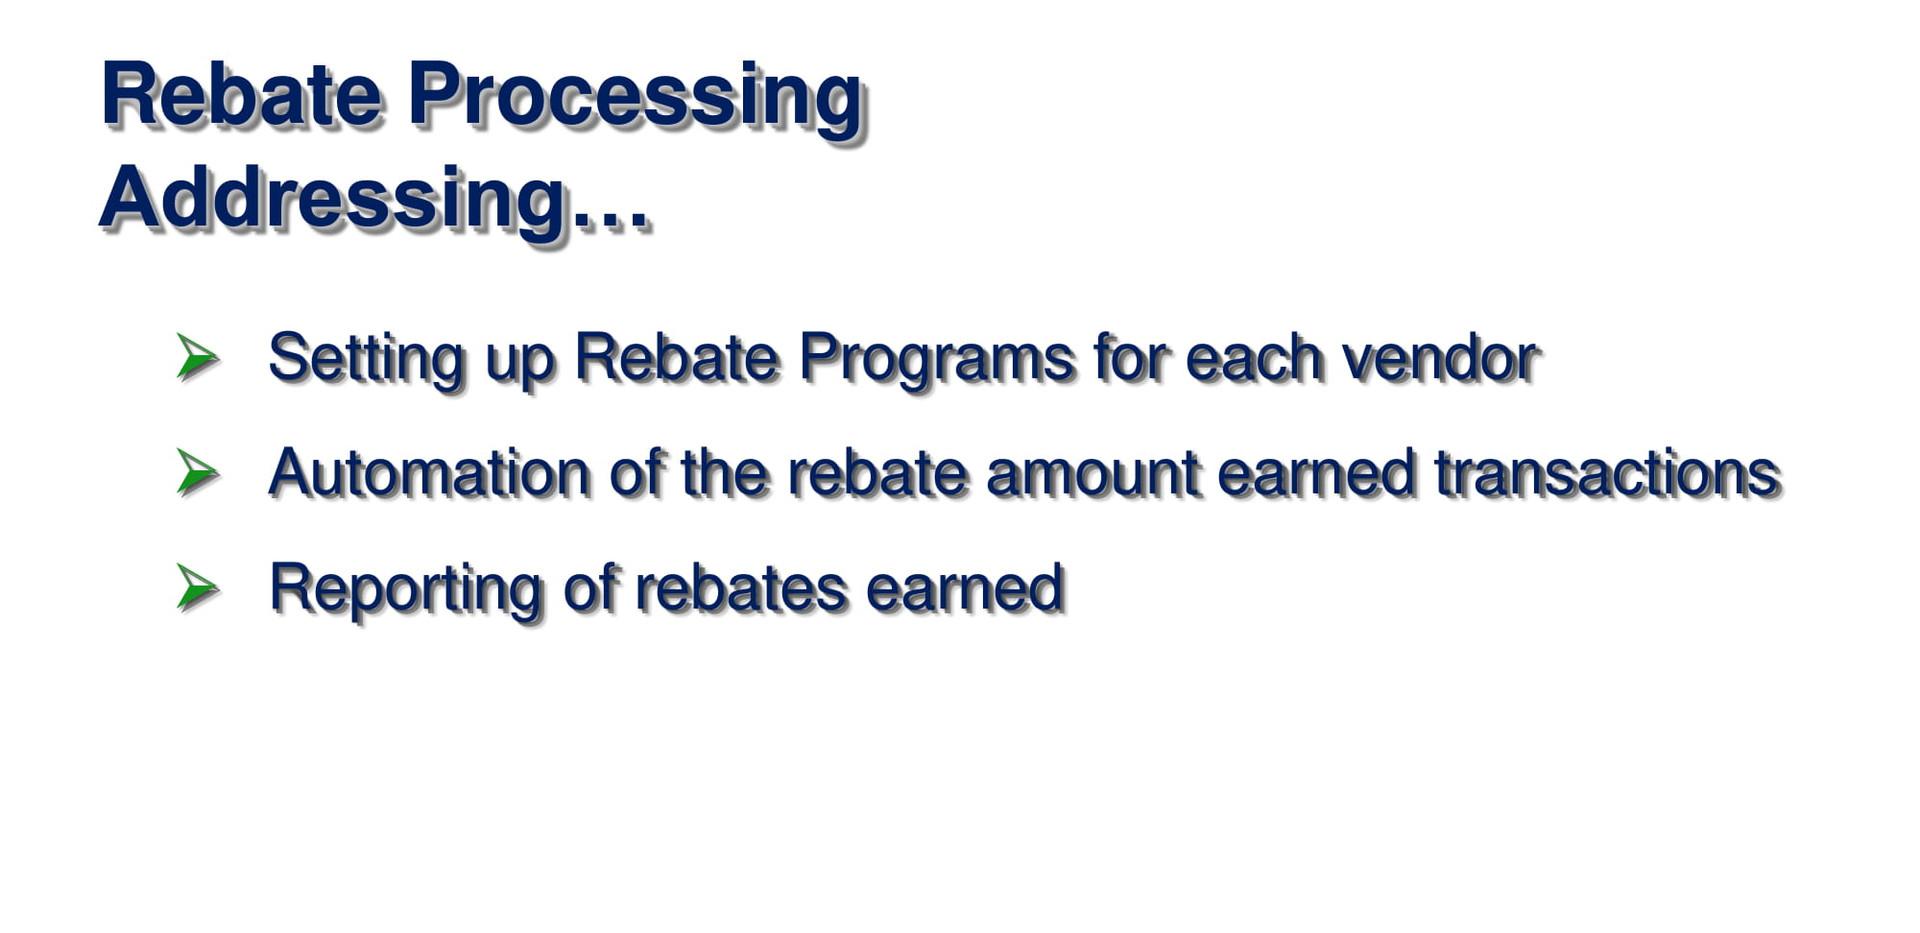 Rebate_Processing PP-04.jpg